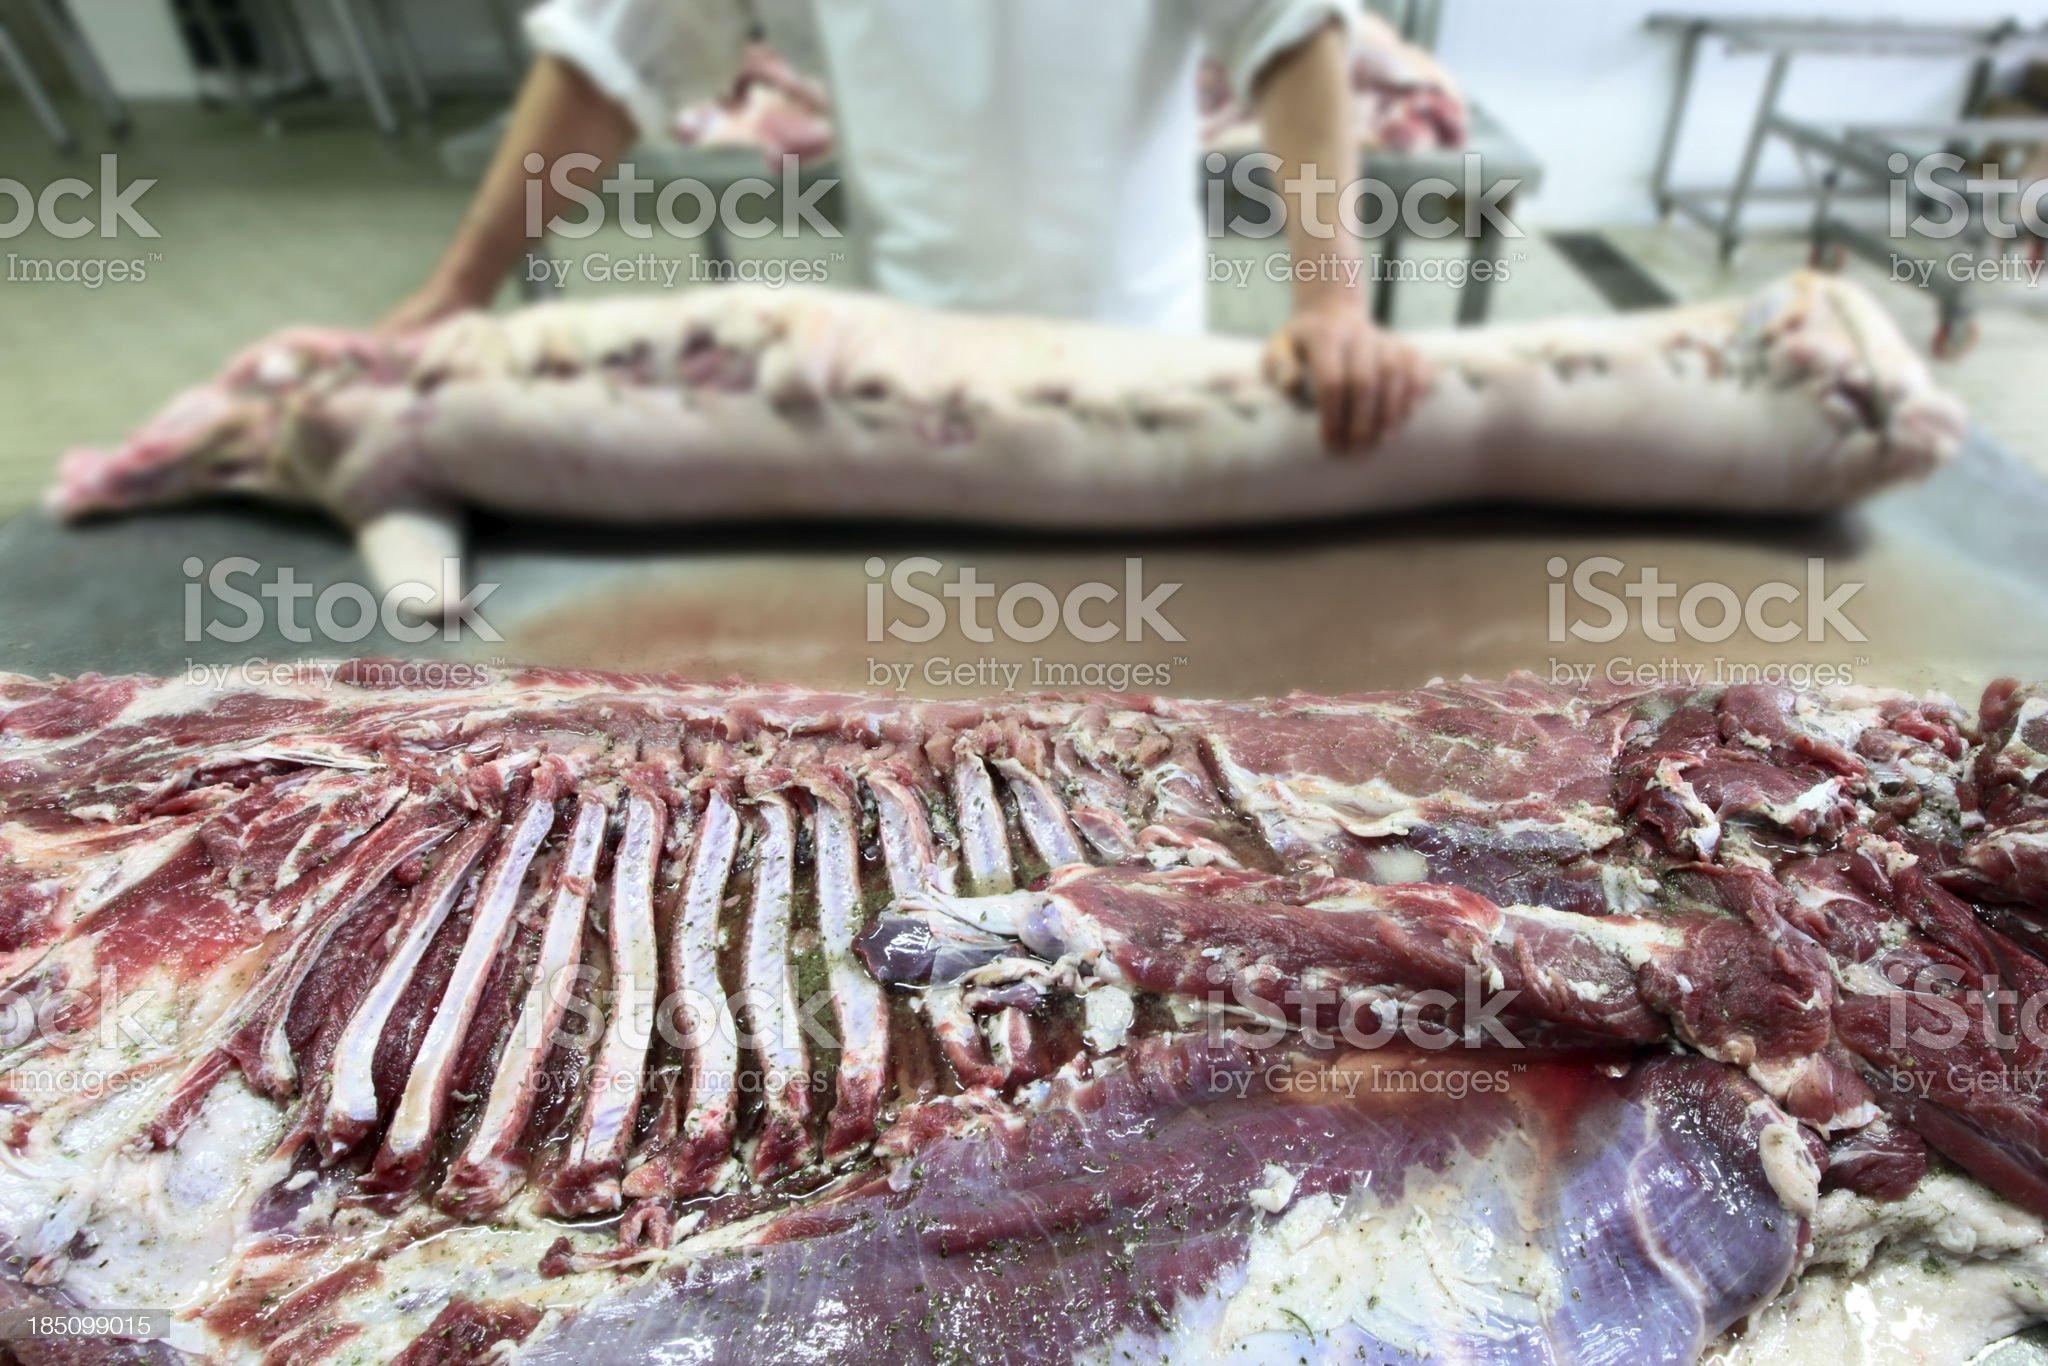 Pork meat royalty-free stock photo